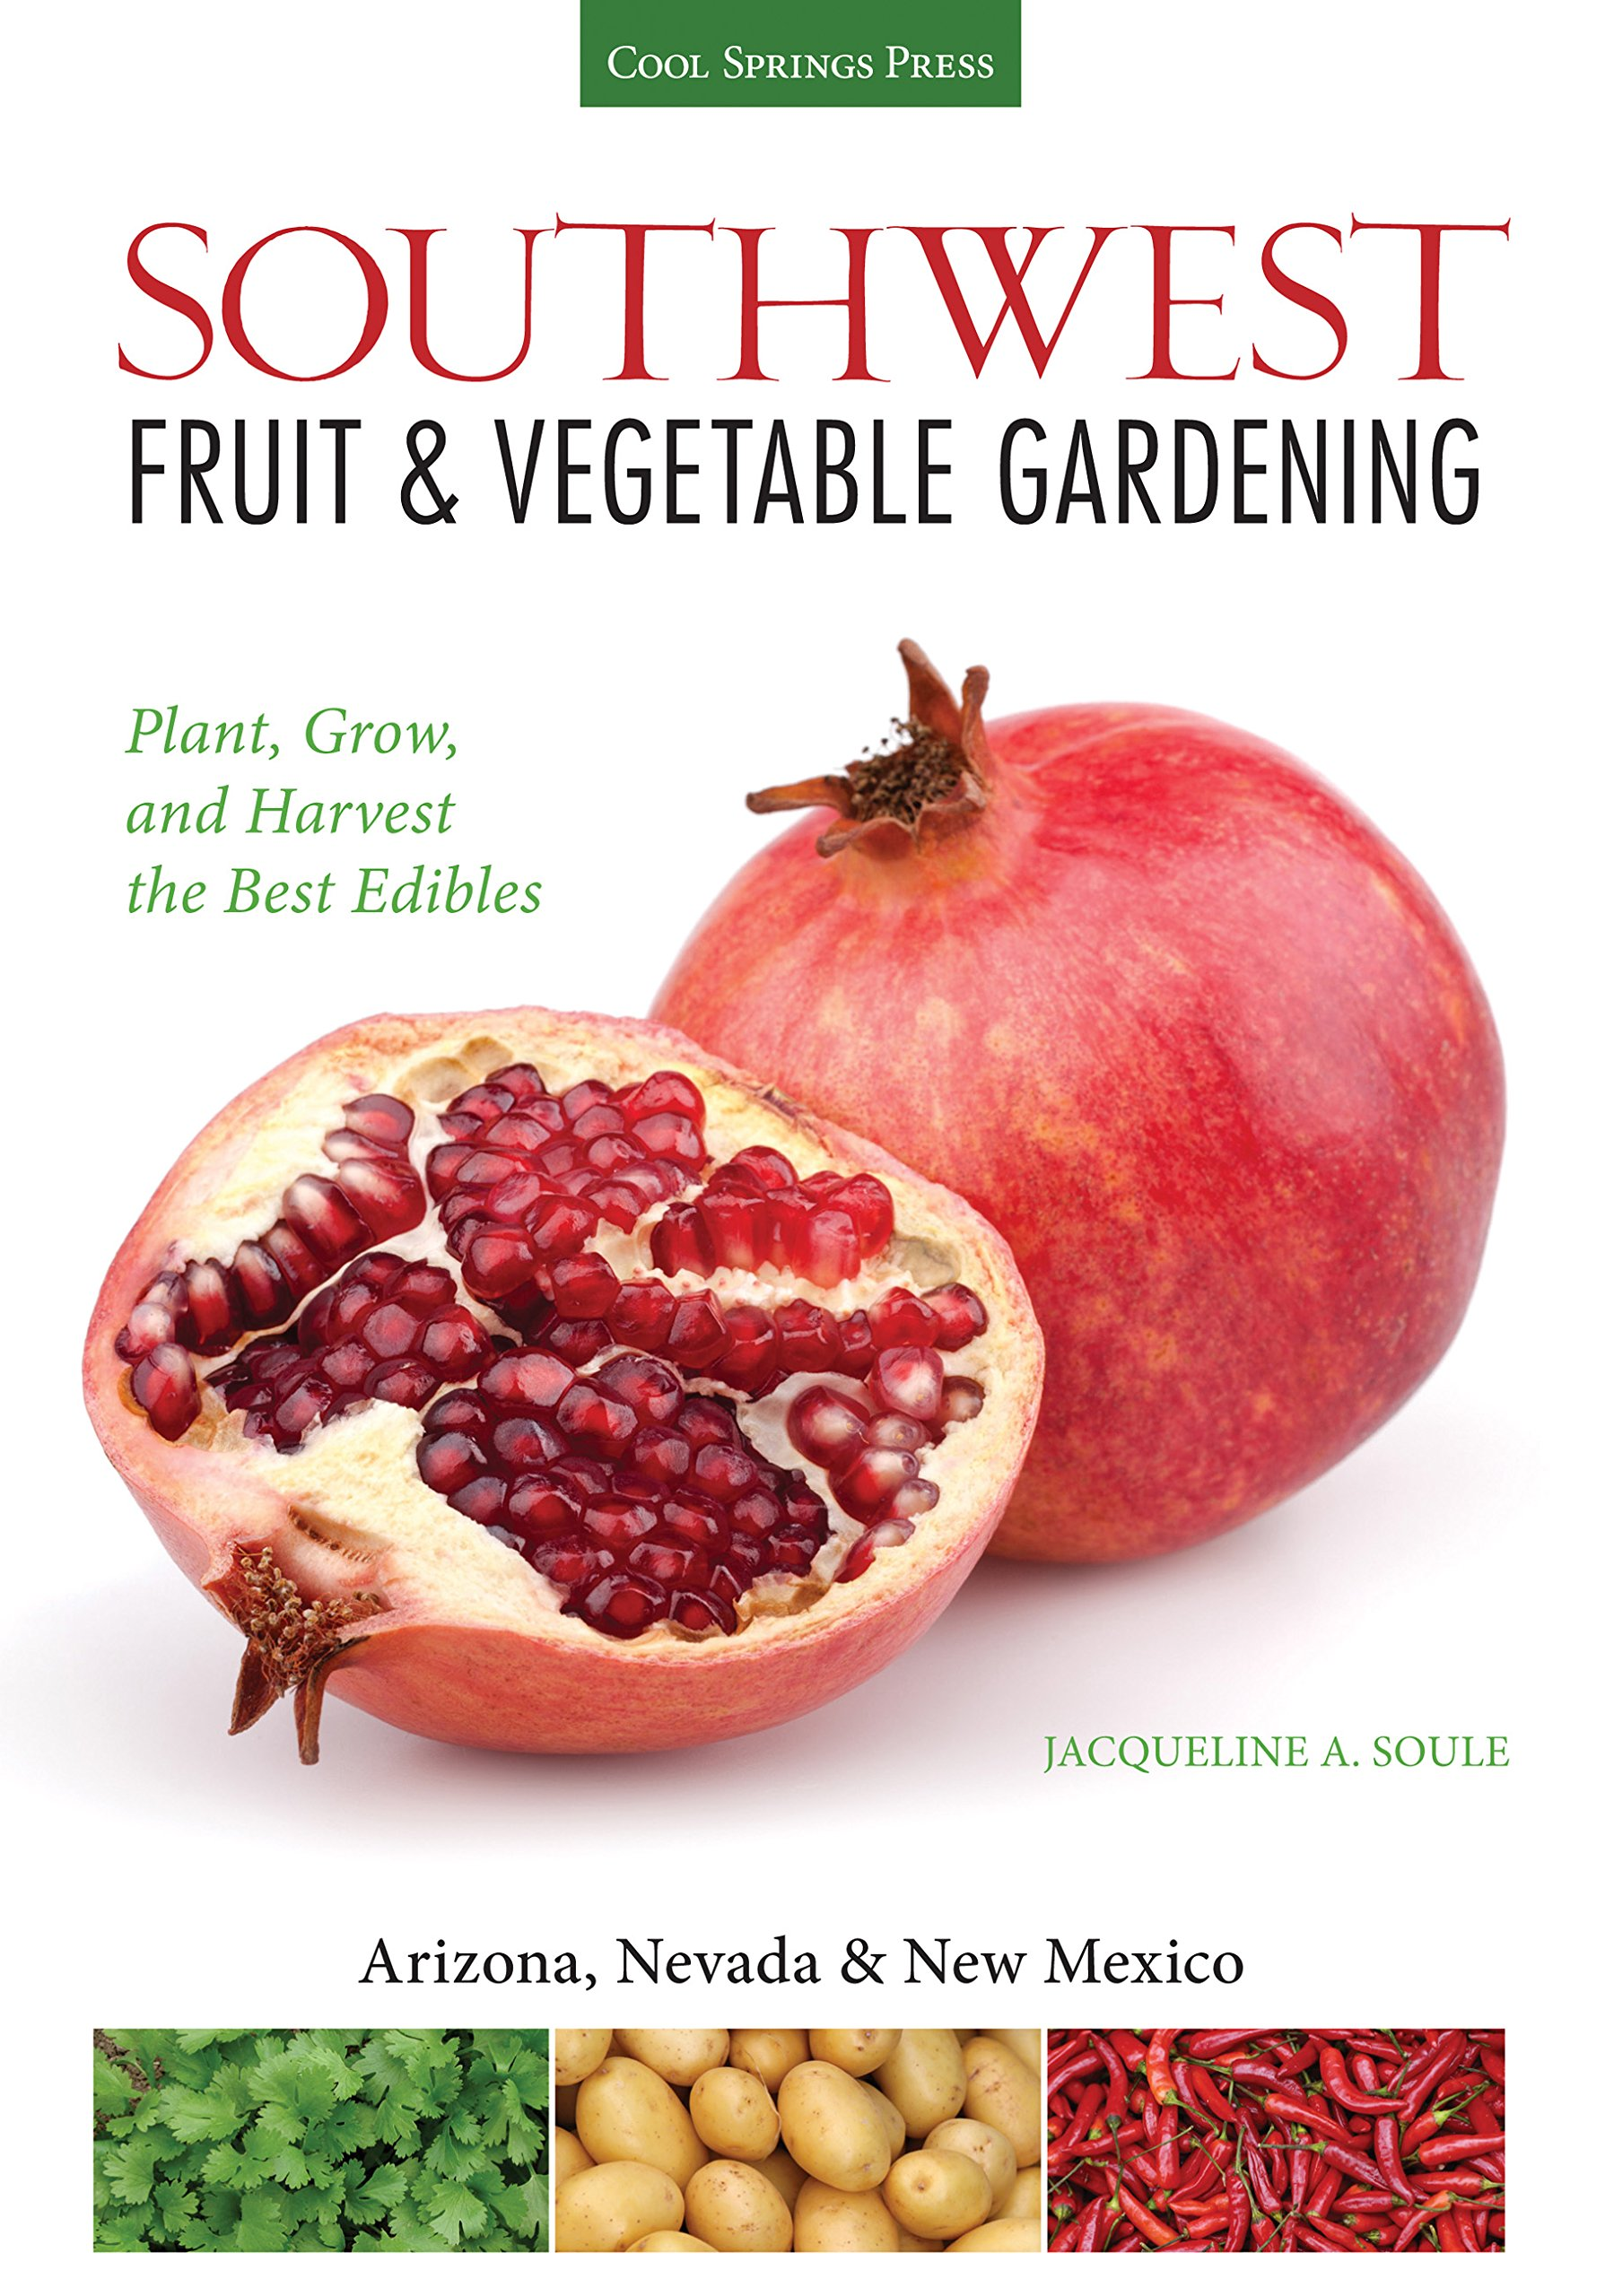 Southwest Fruit & Vegetable Gardening: Plant, Grow, and Harvest the Best Edibles - Arizona, Nevada & New Mexico (Fruit & Vegetable Gardening Guides)